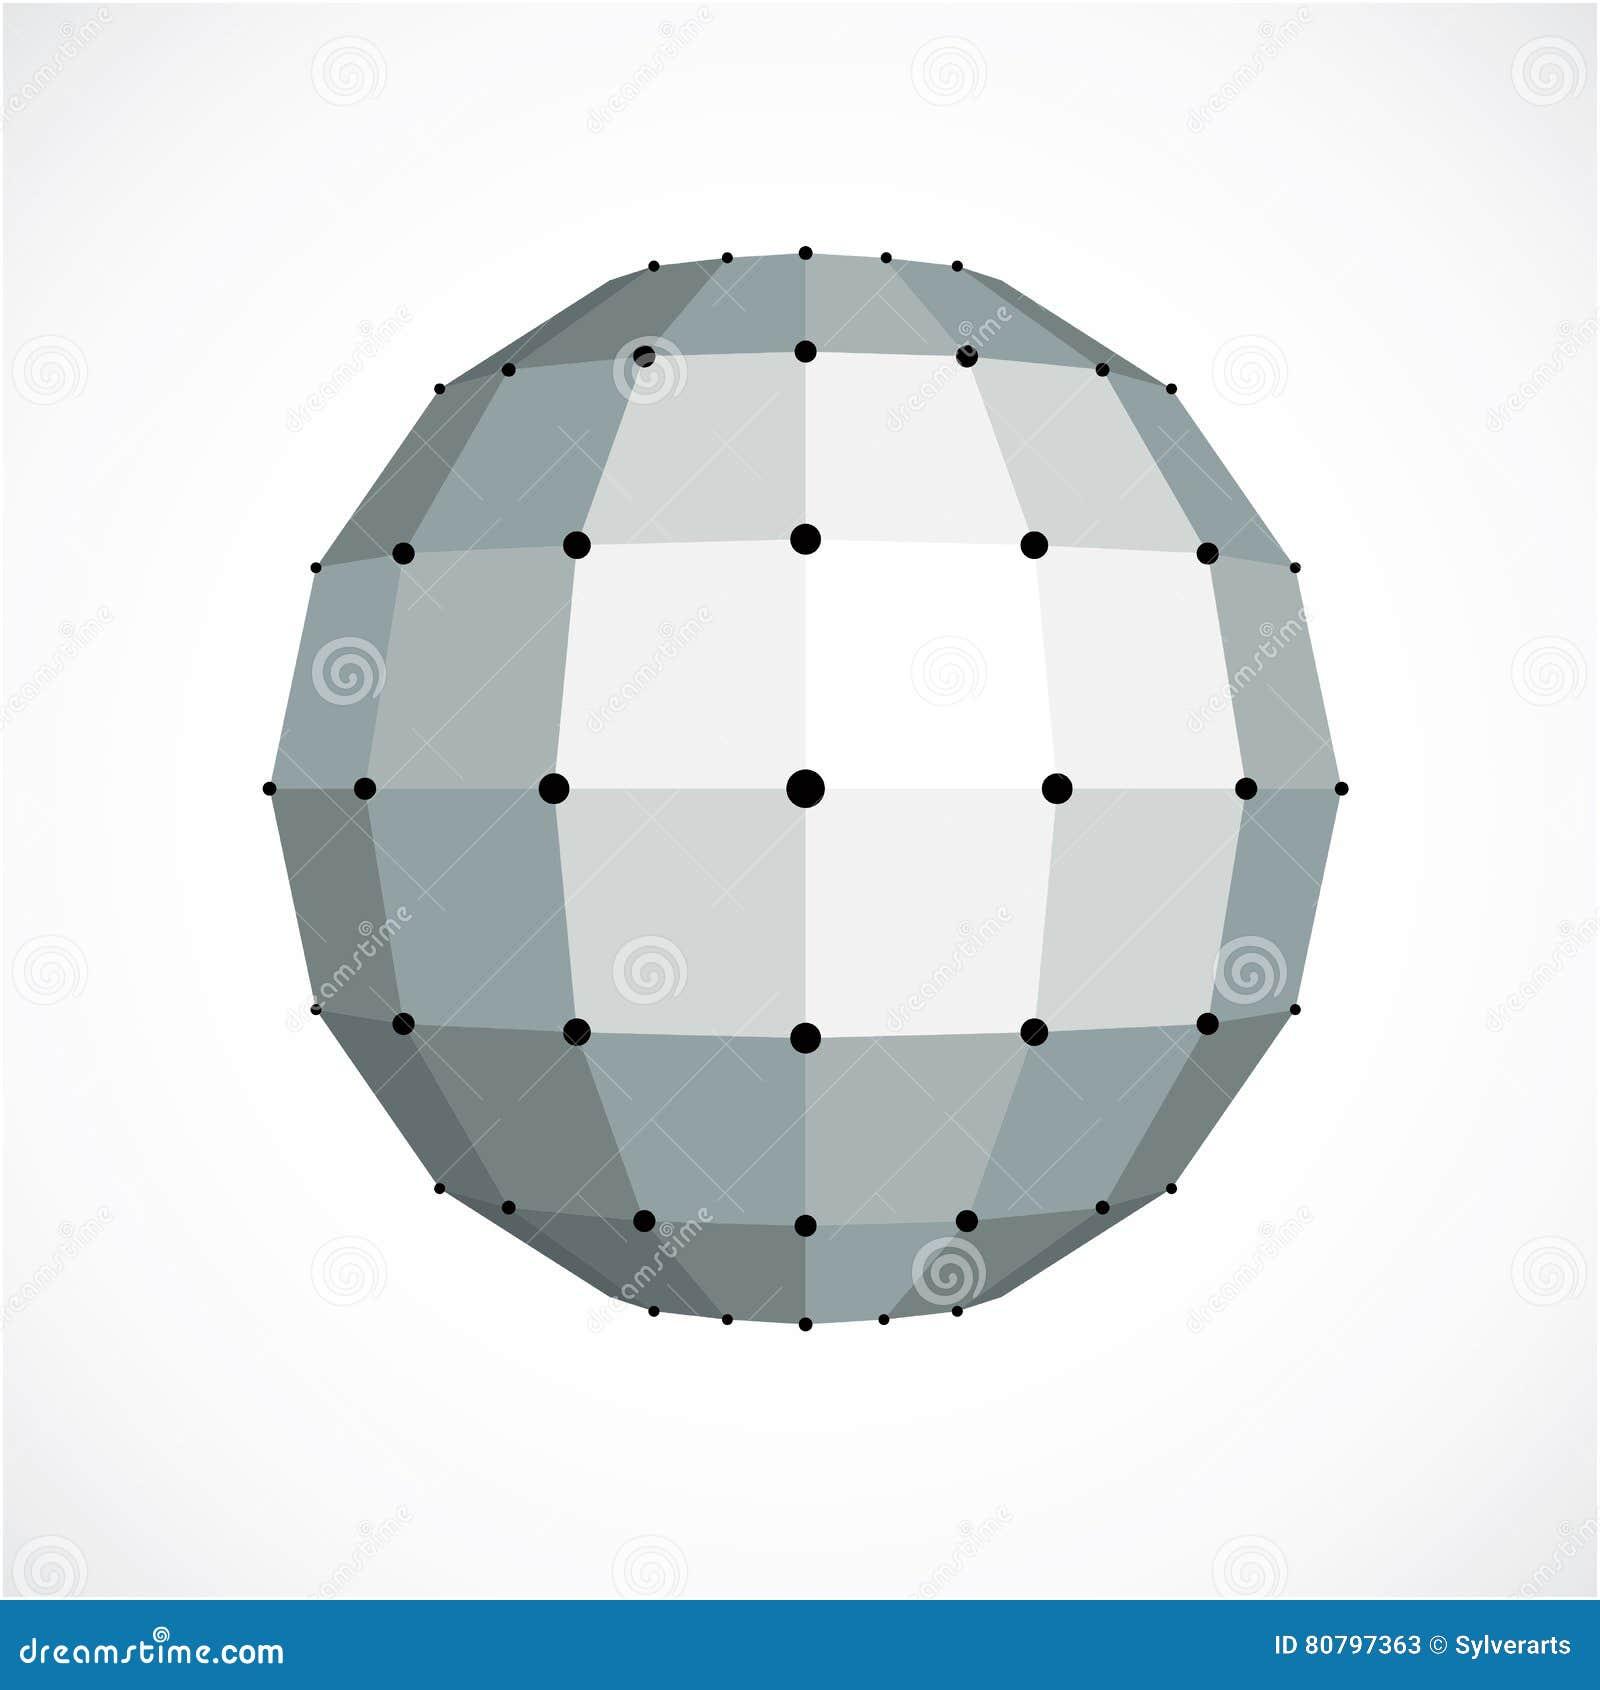 Monochrome Dimensional Low Poly Object, Trigonometry Shap Stock